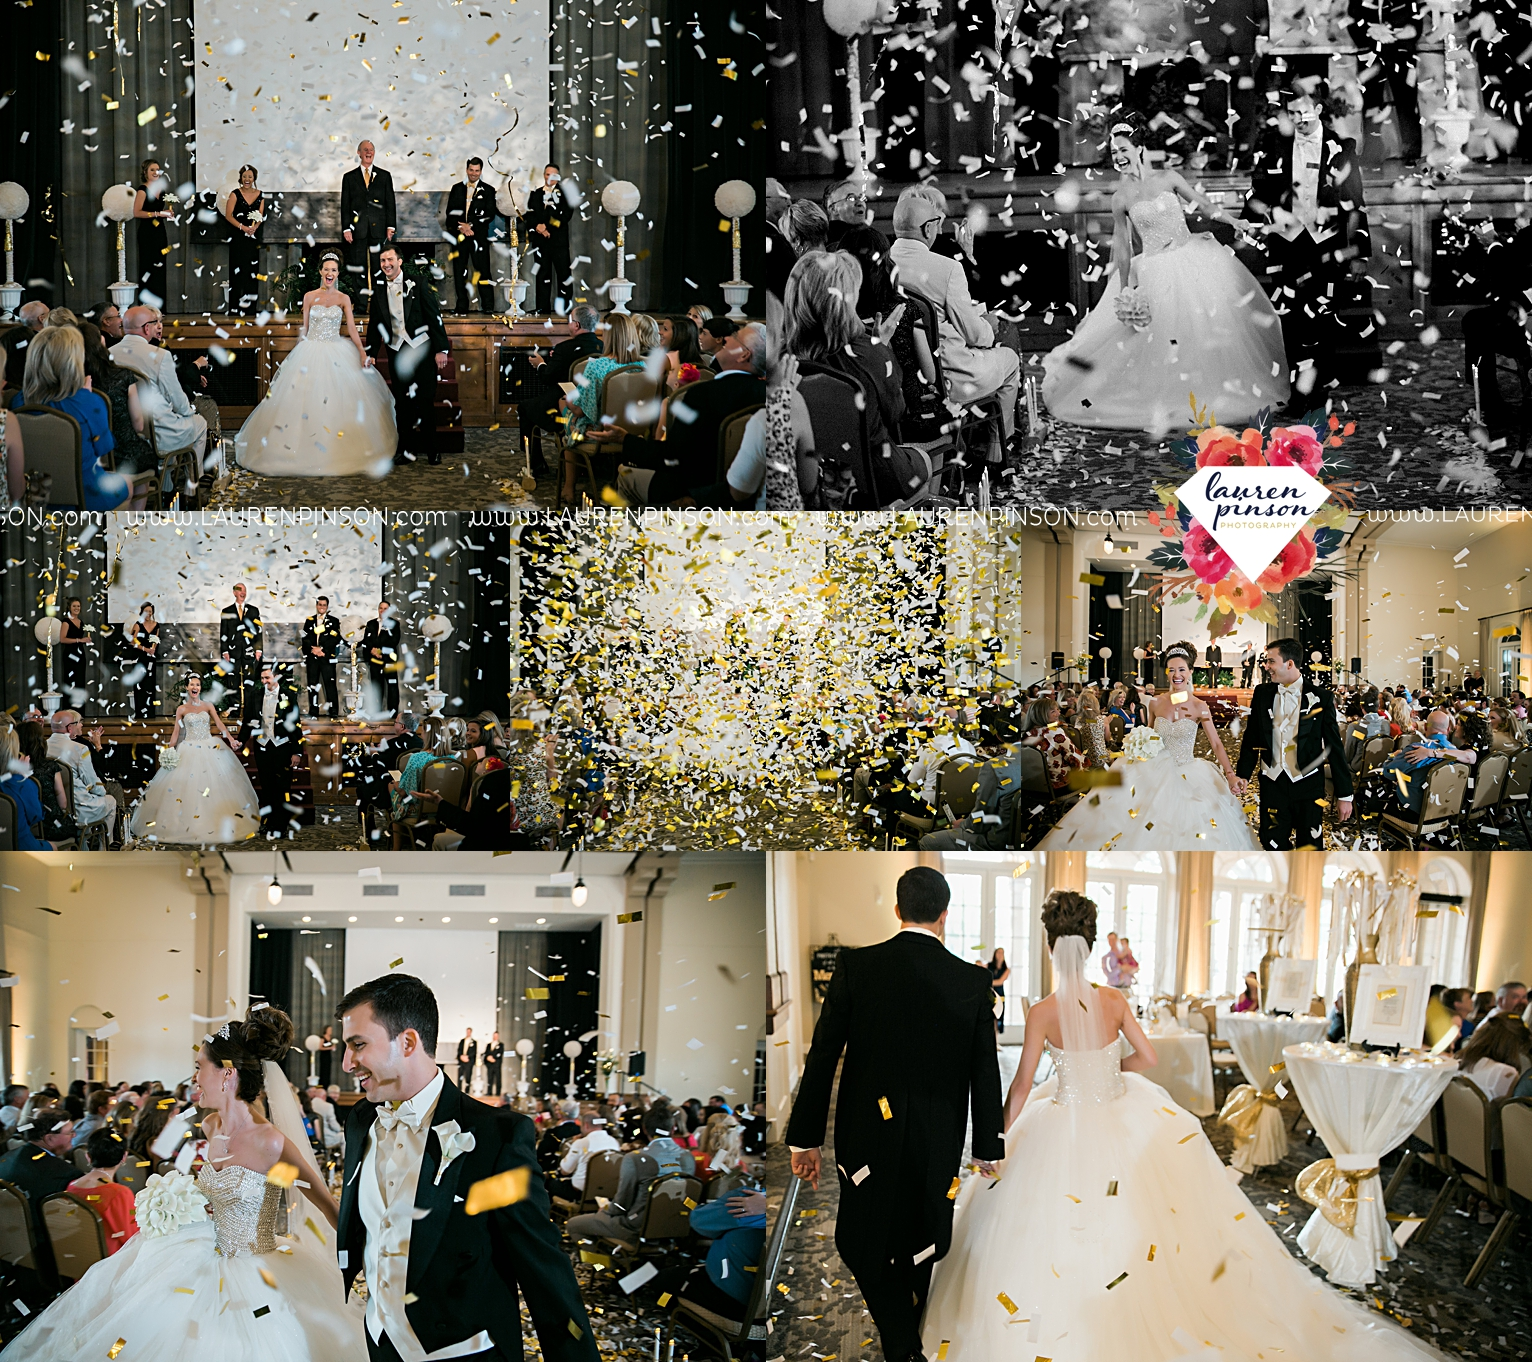 wichita-falls-texas-wedding-photographer-the-forum-by-the-kemp-mayfield-events-ulta-gold-glitter_2870.jpg